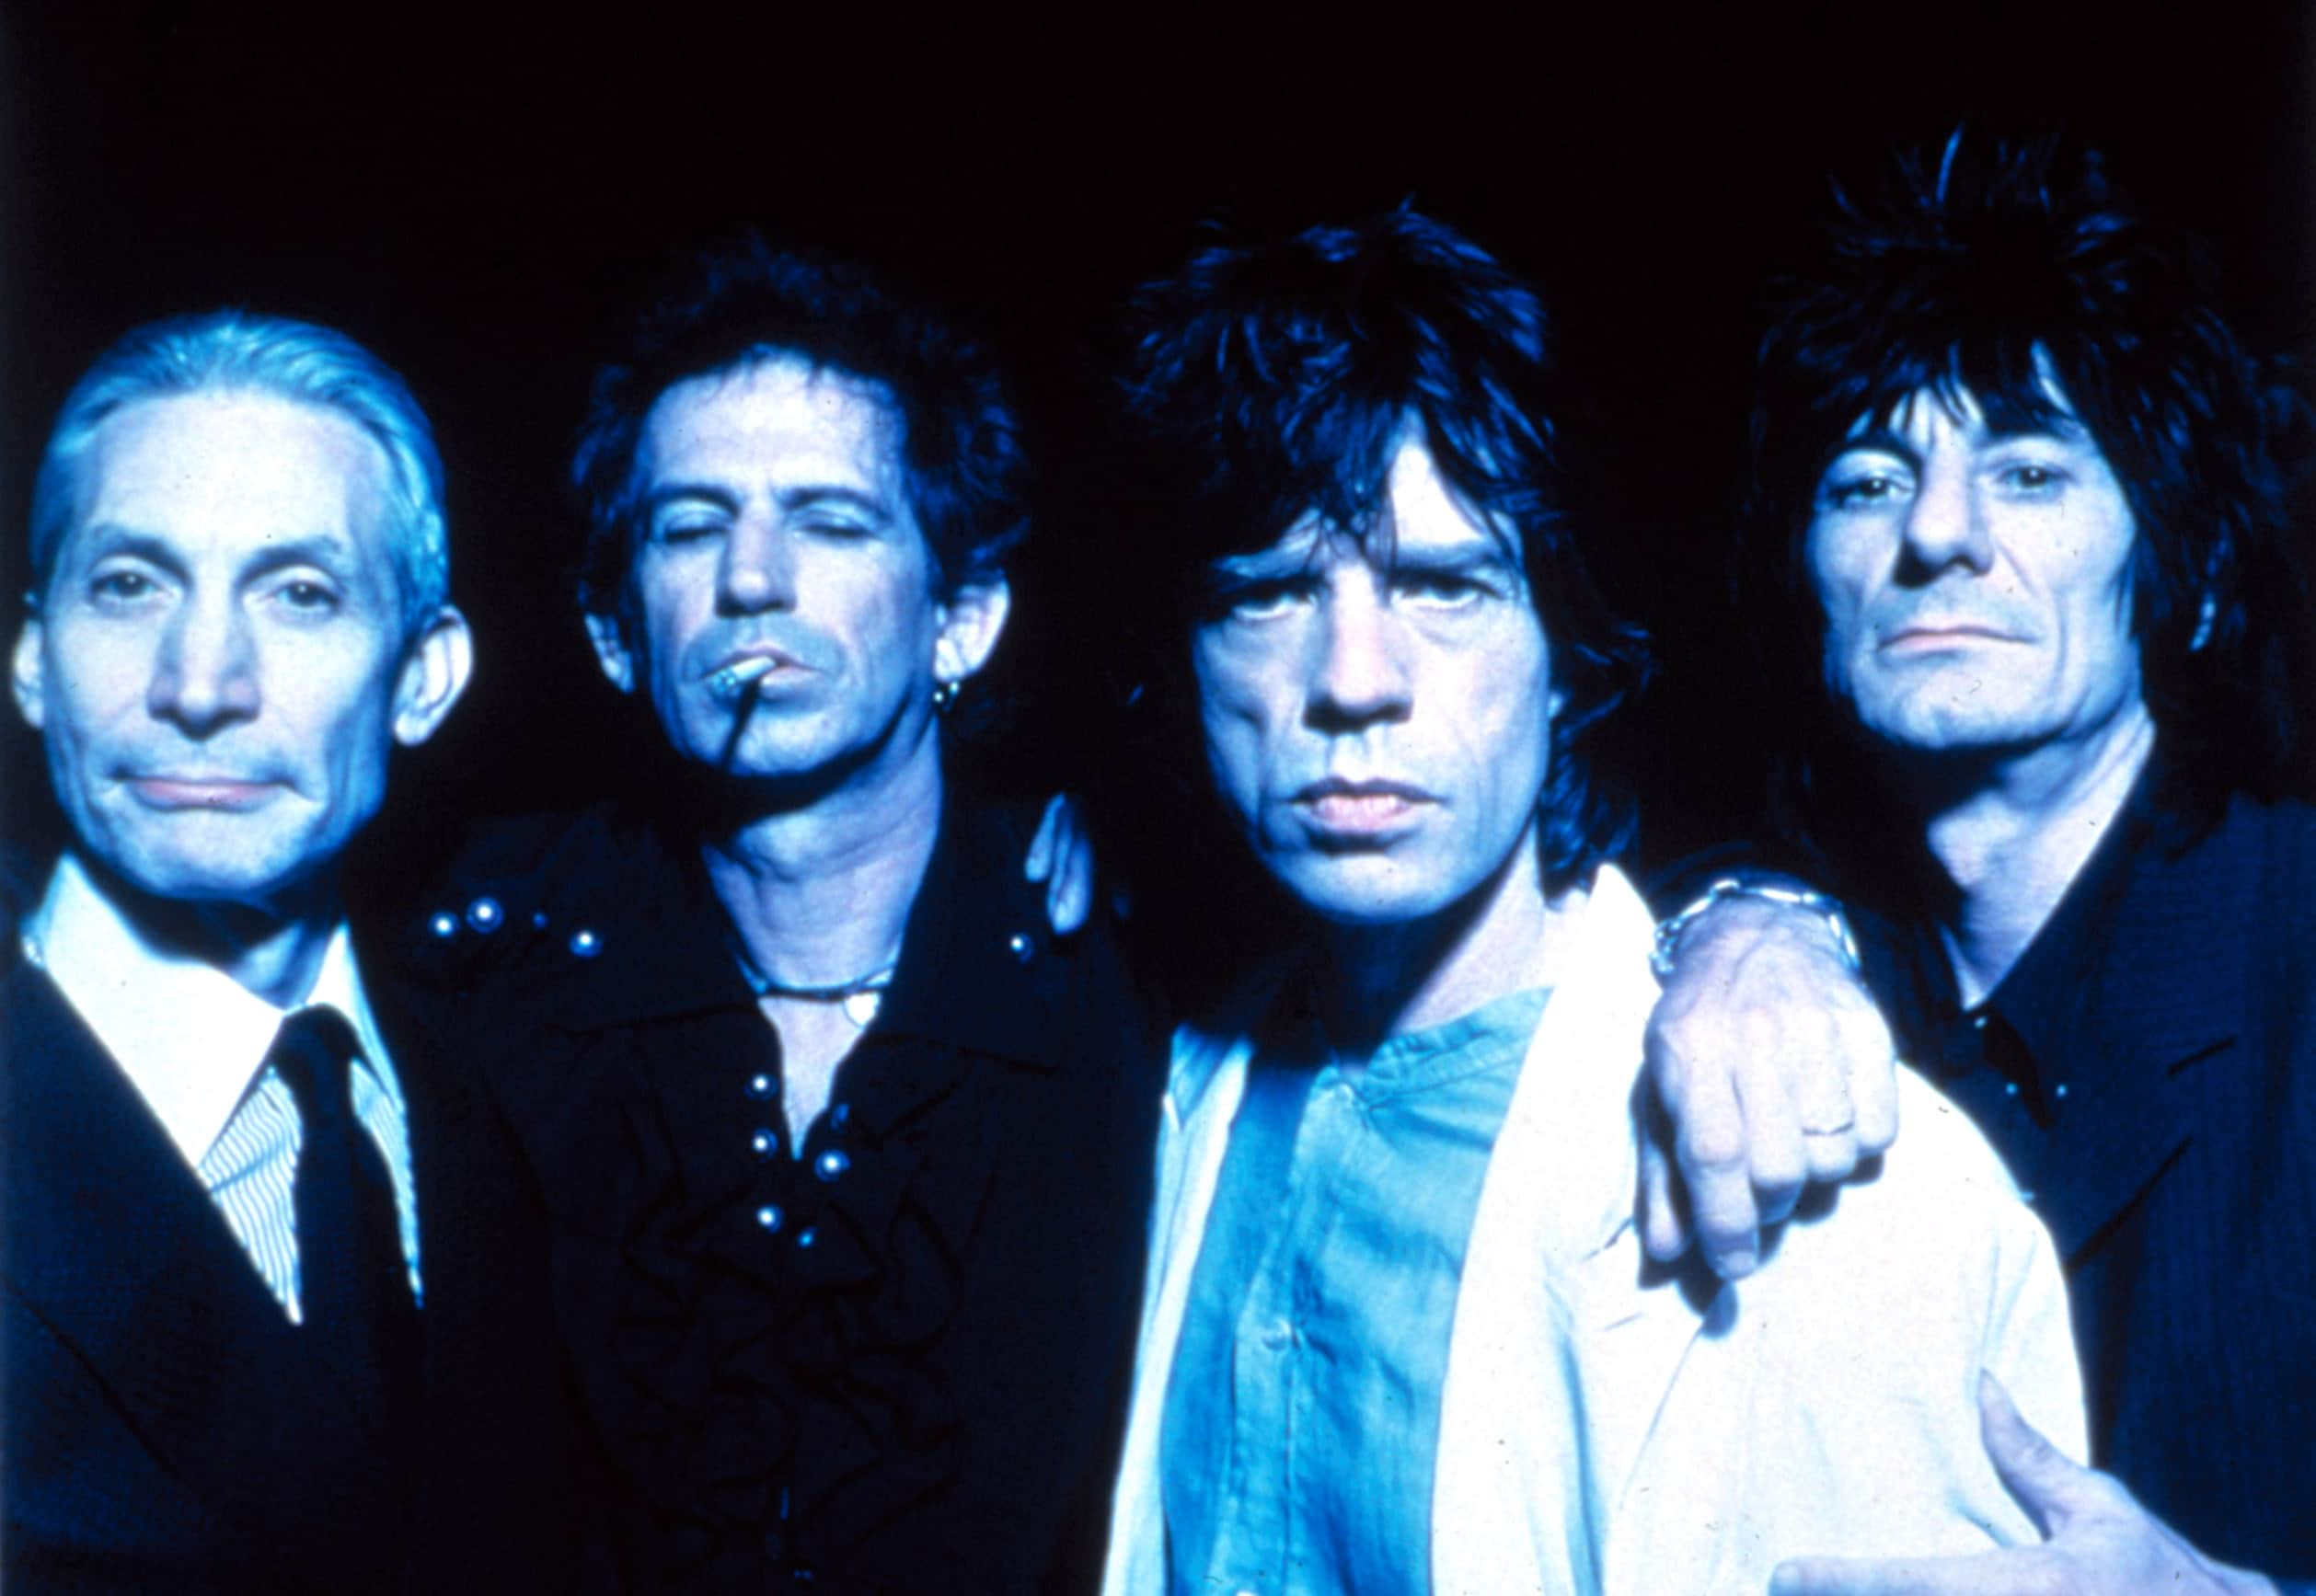 ROLLING STONES: VOODOO LOUNGE, The Rolling Stones, 1994